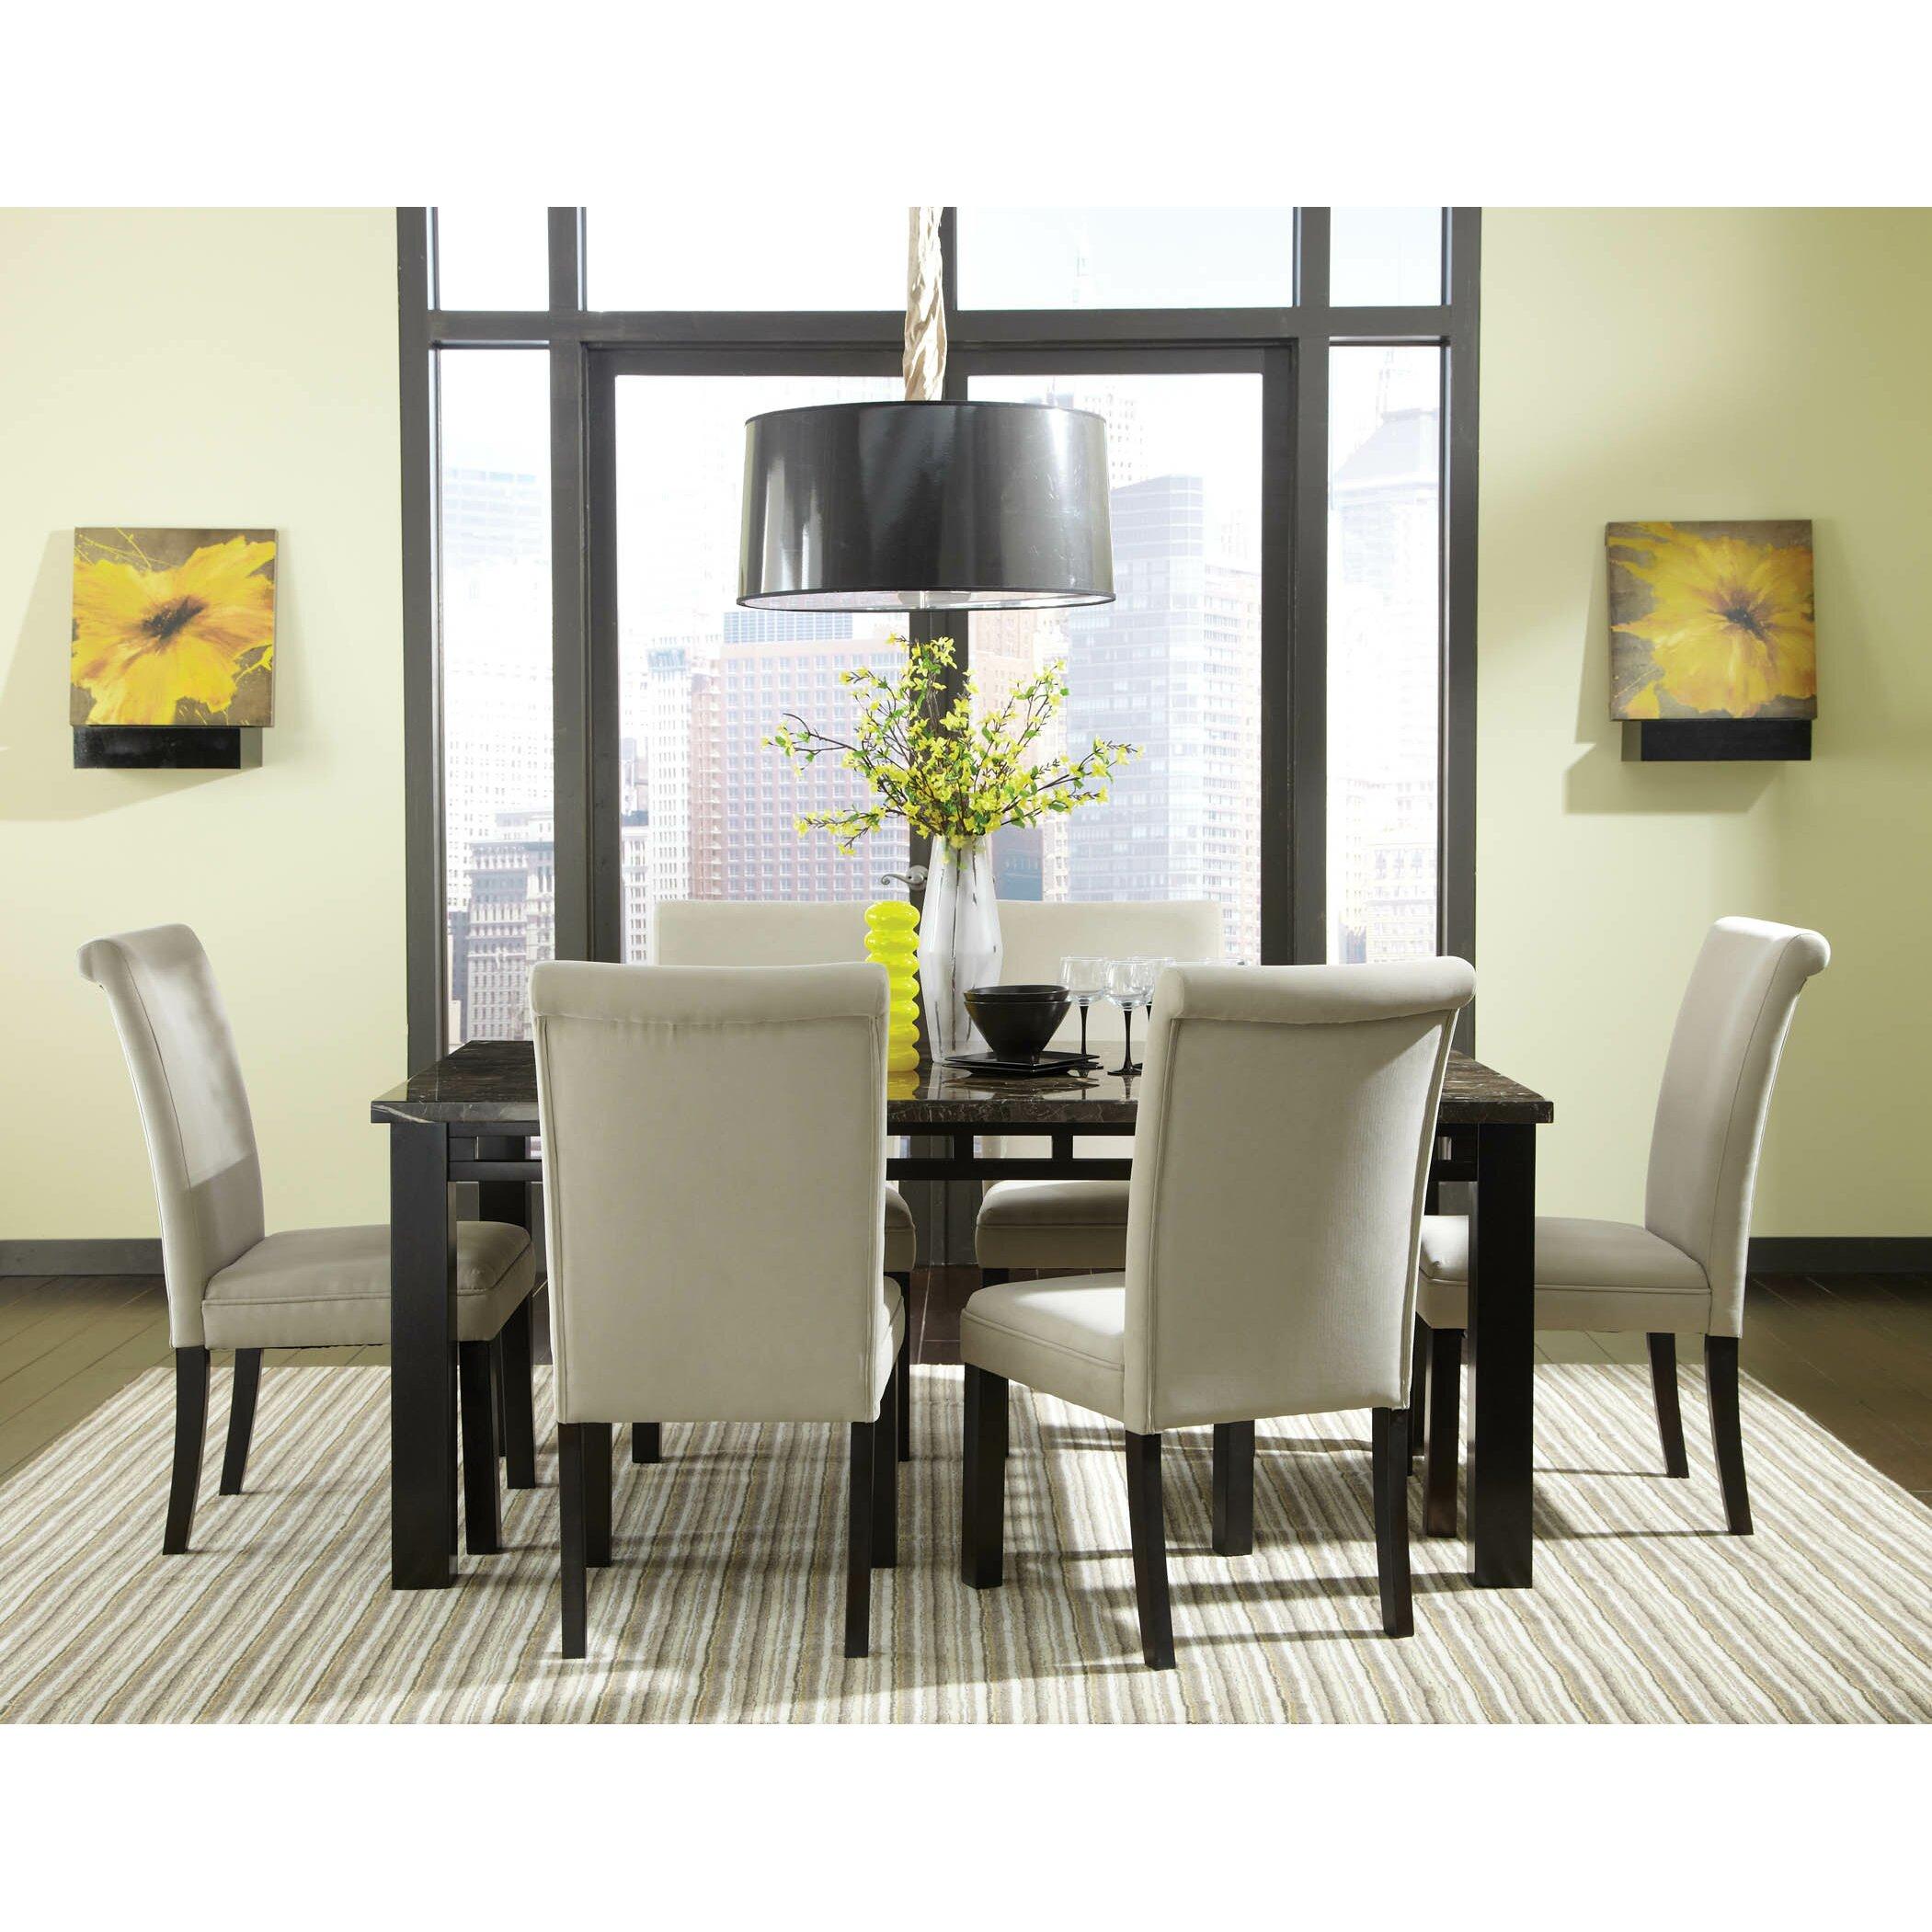 Wayfair Dining Table SetMarble Pub And Chairs